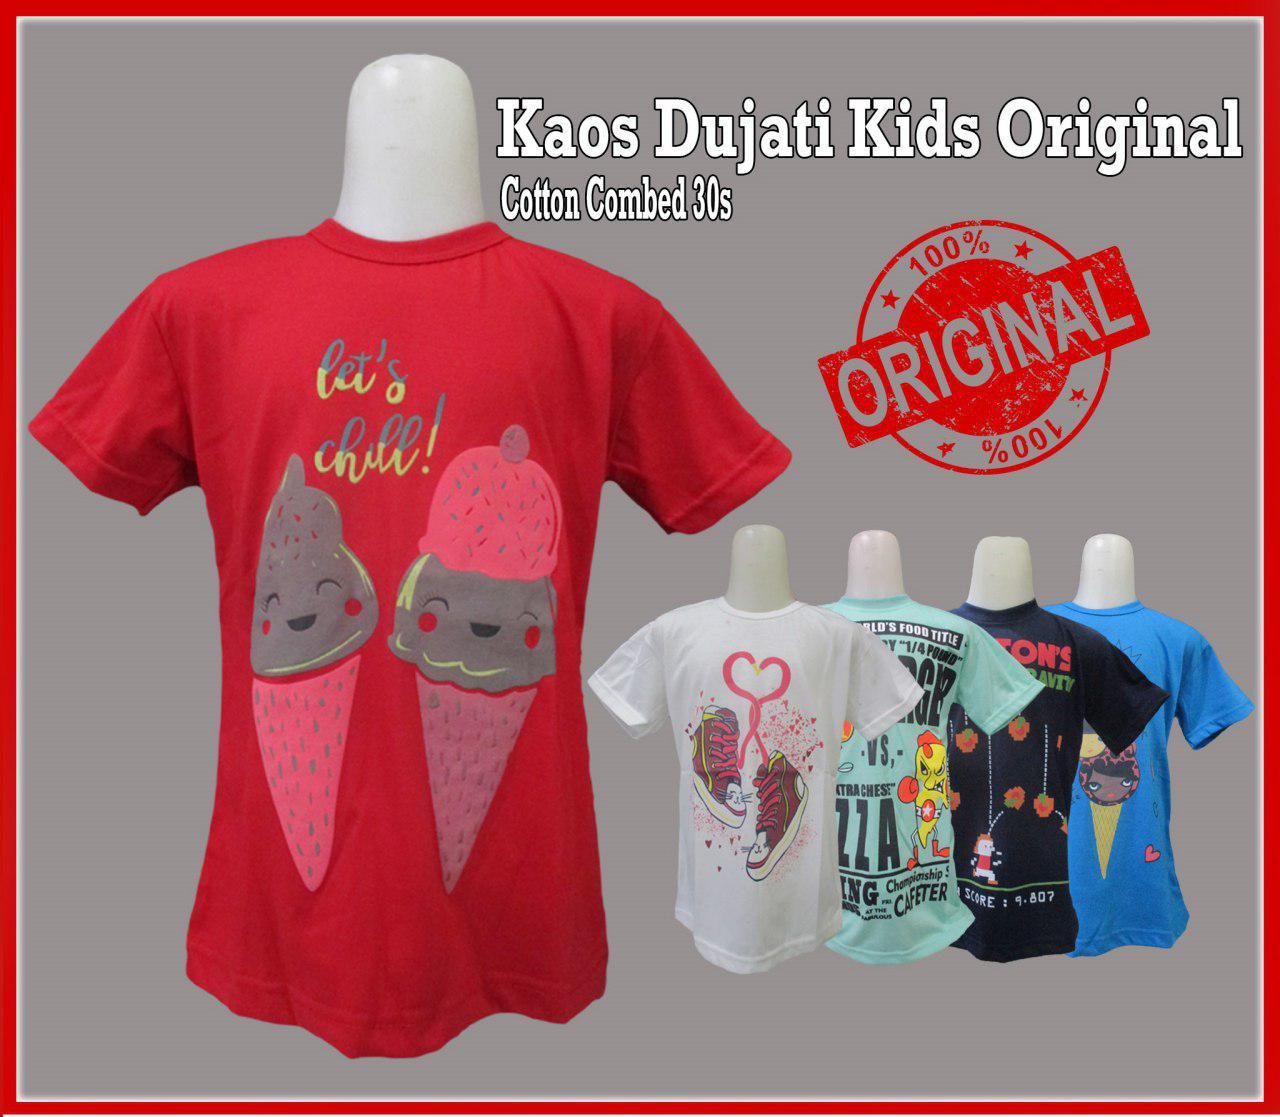 Grosir Kaos Dujati Kids Original Murah 20ribuan